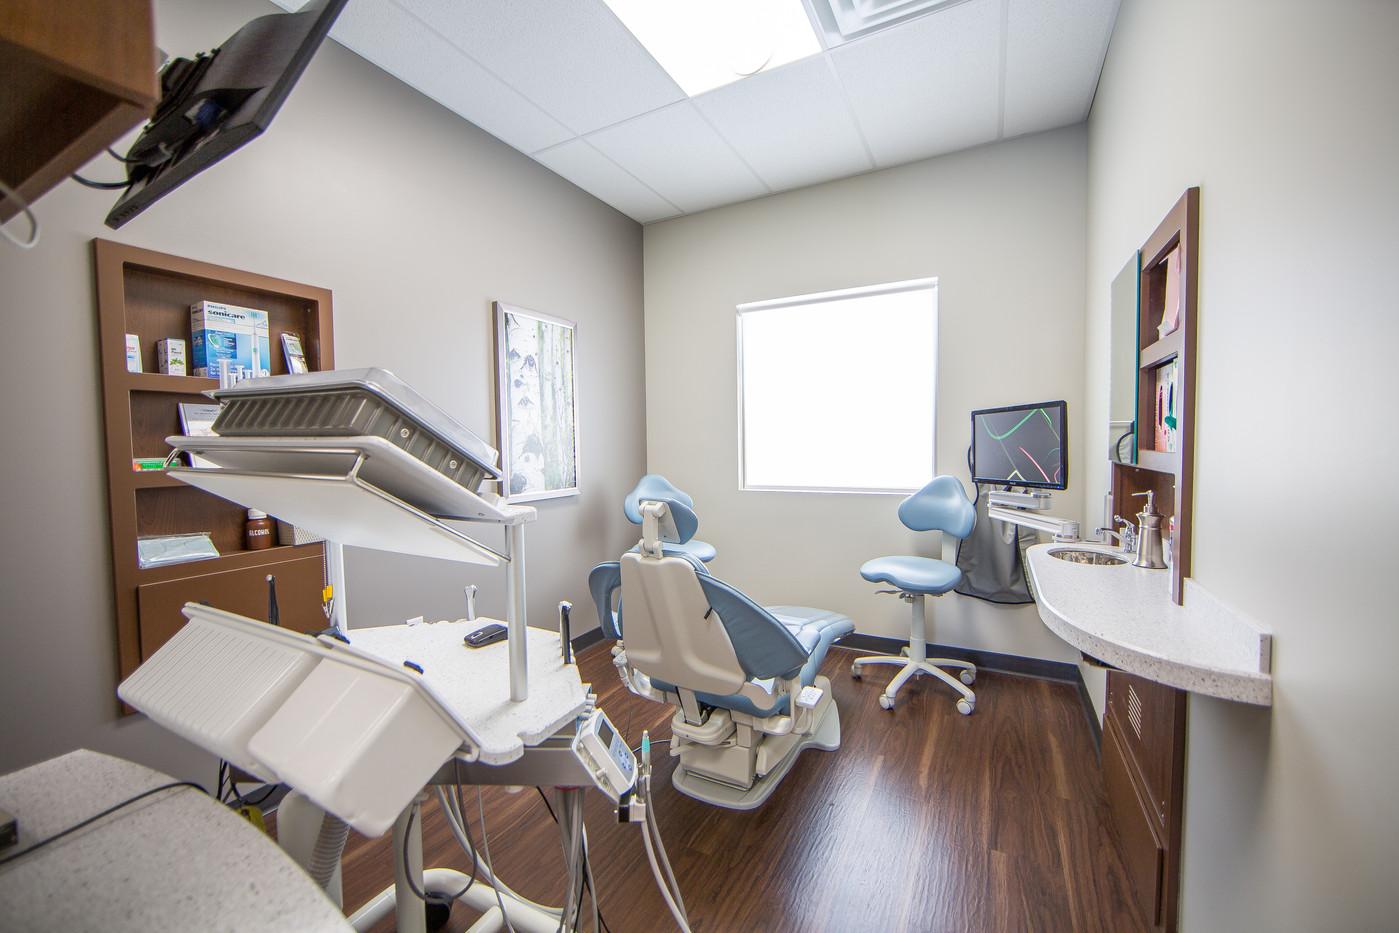 WhitePine Dental Office